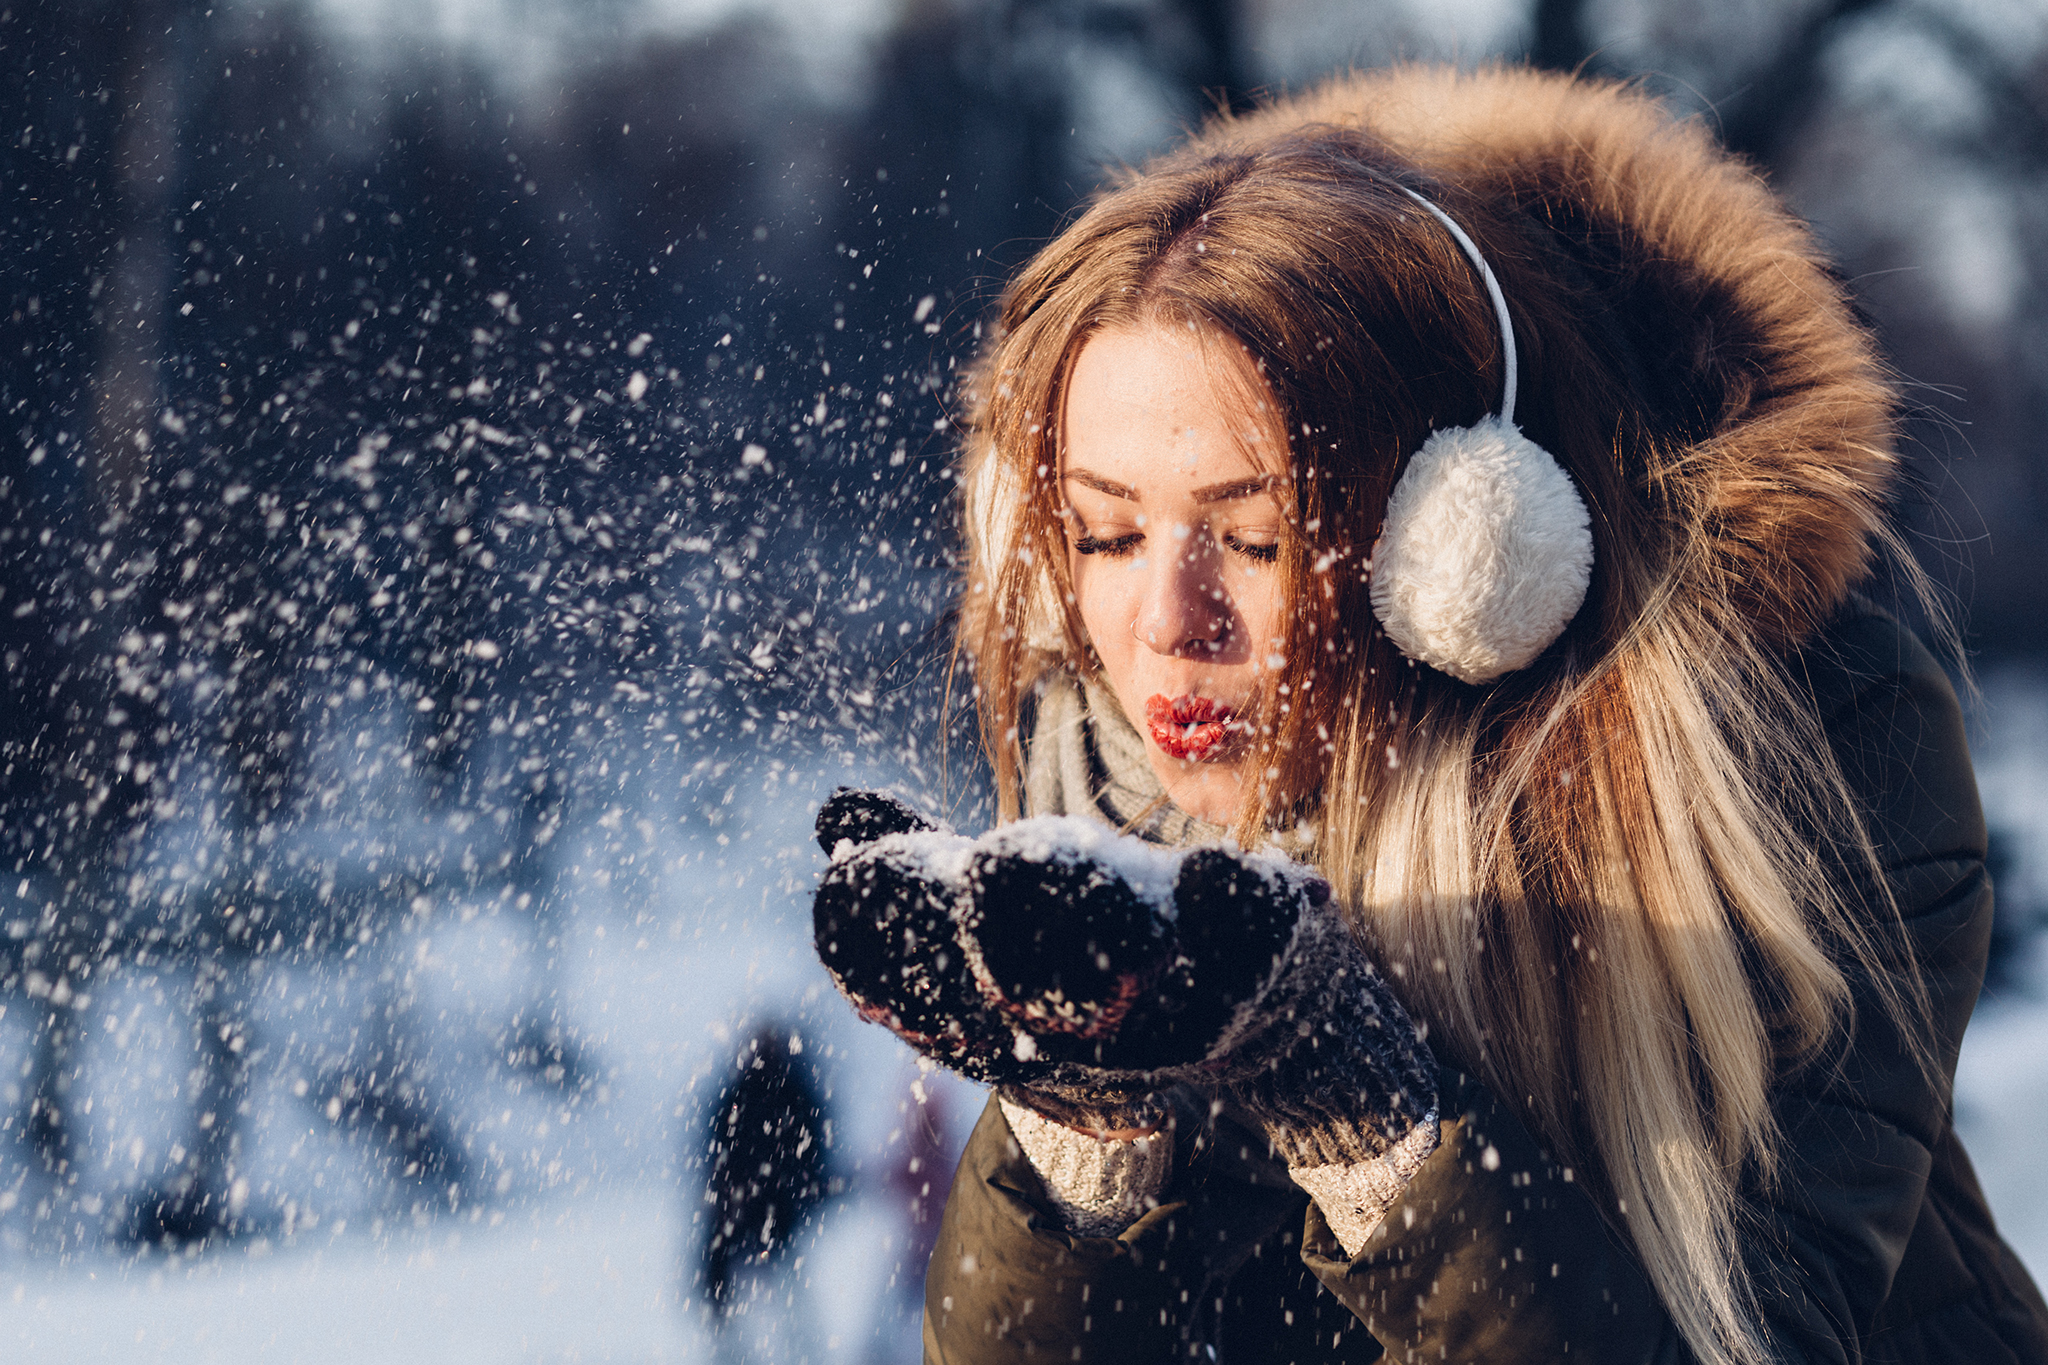 beatvyne Sounds of December